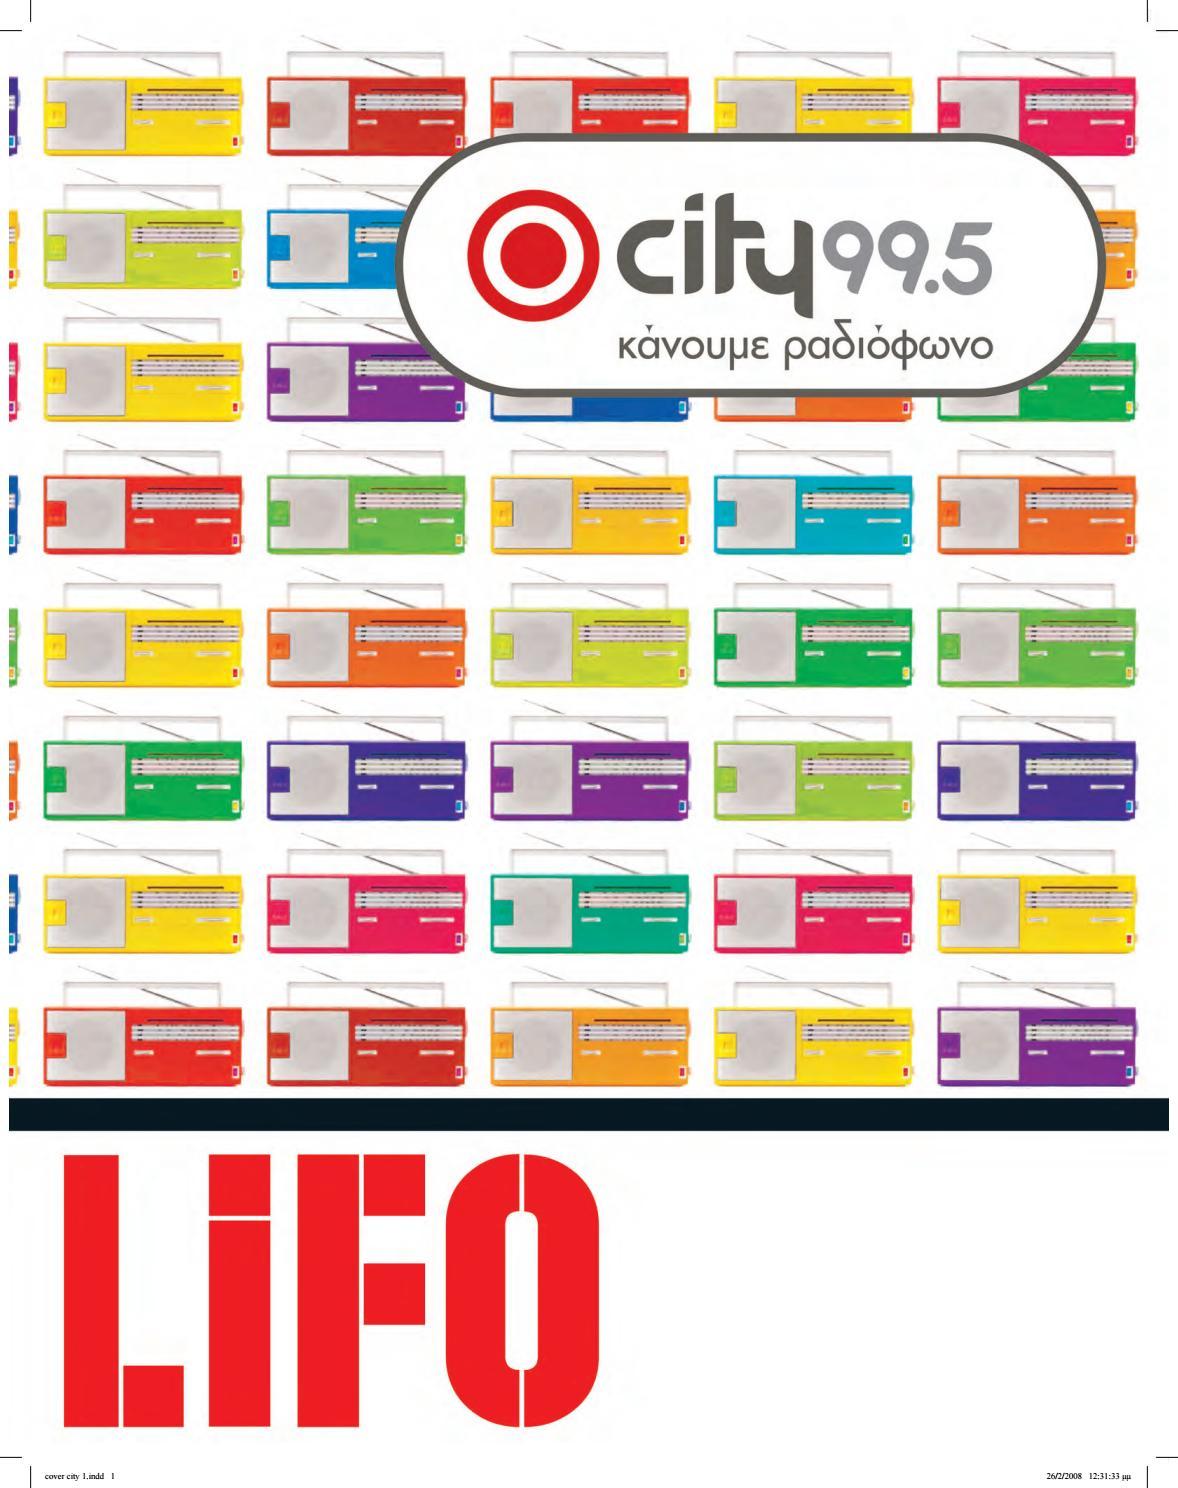 1921455ec6e4 101 by Dyo Deka S.A. - issuu